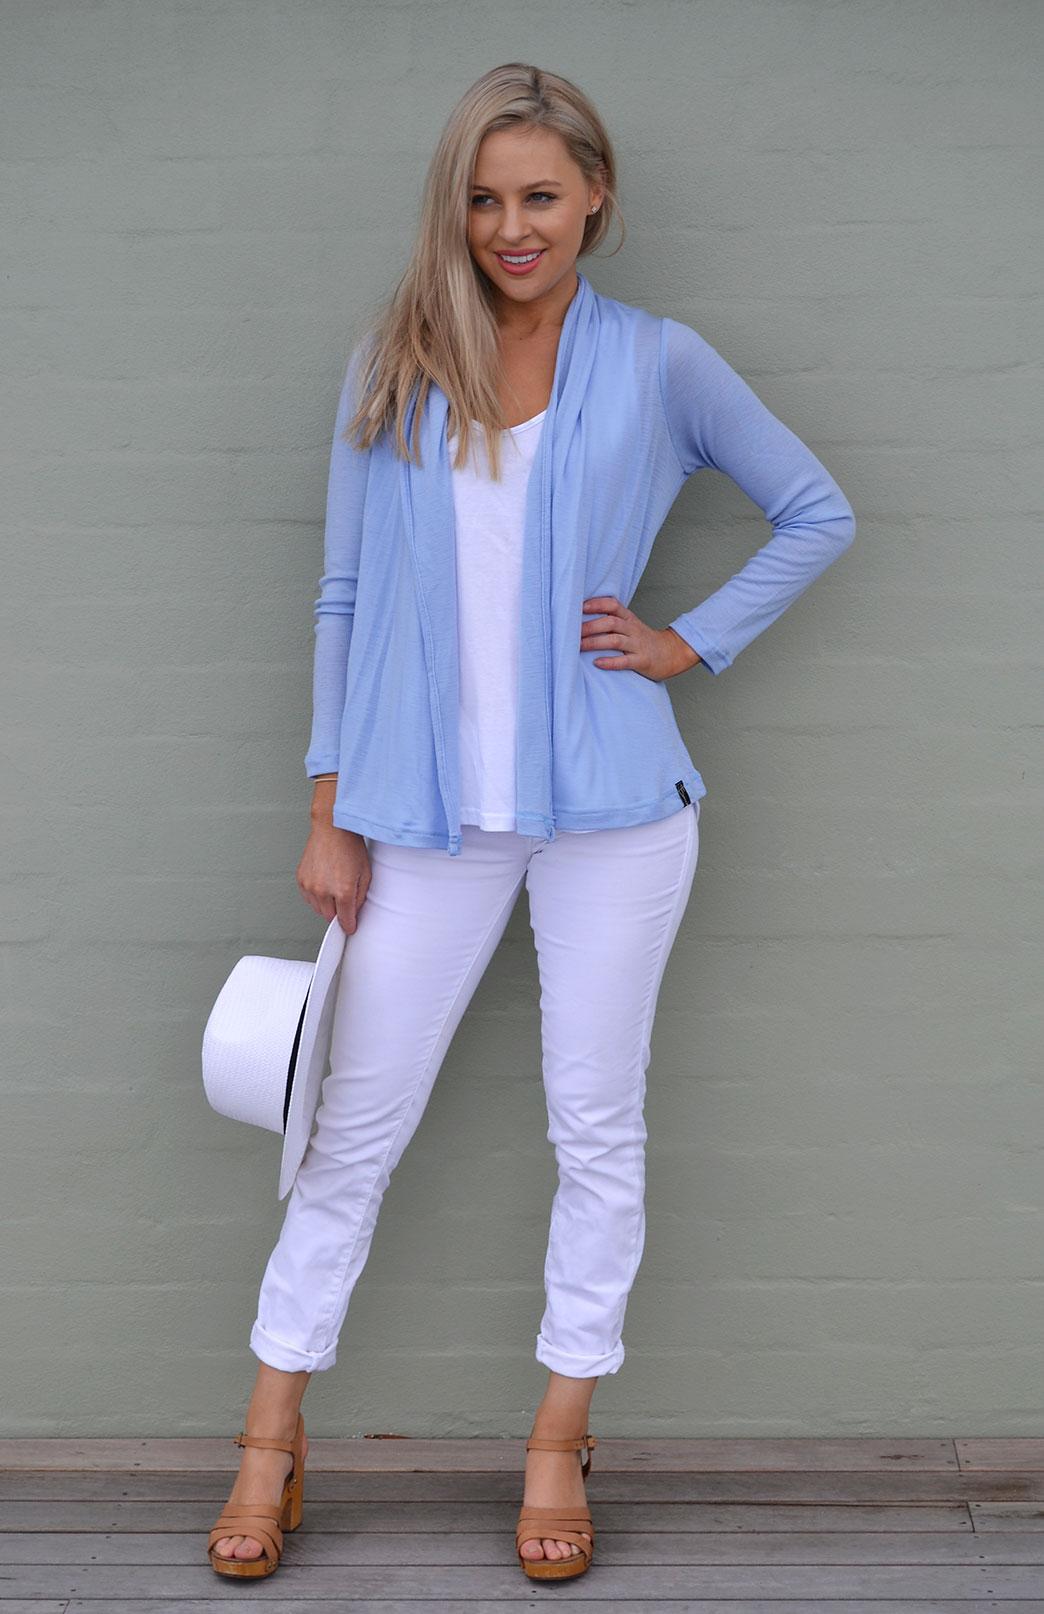 Mini Drape Cardigan - Women's Soft Pale Blue Long Sleeve Merino Wool Cardigan - Smitten Merino Tasmania Australia